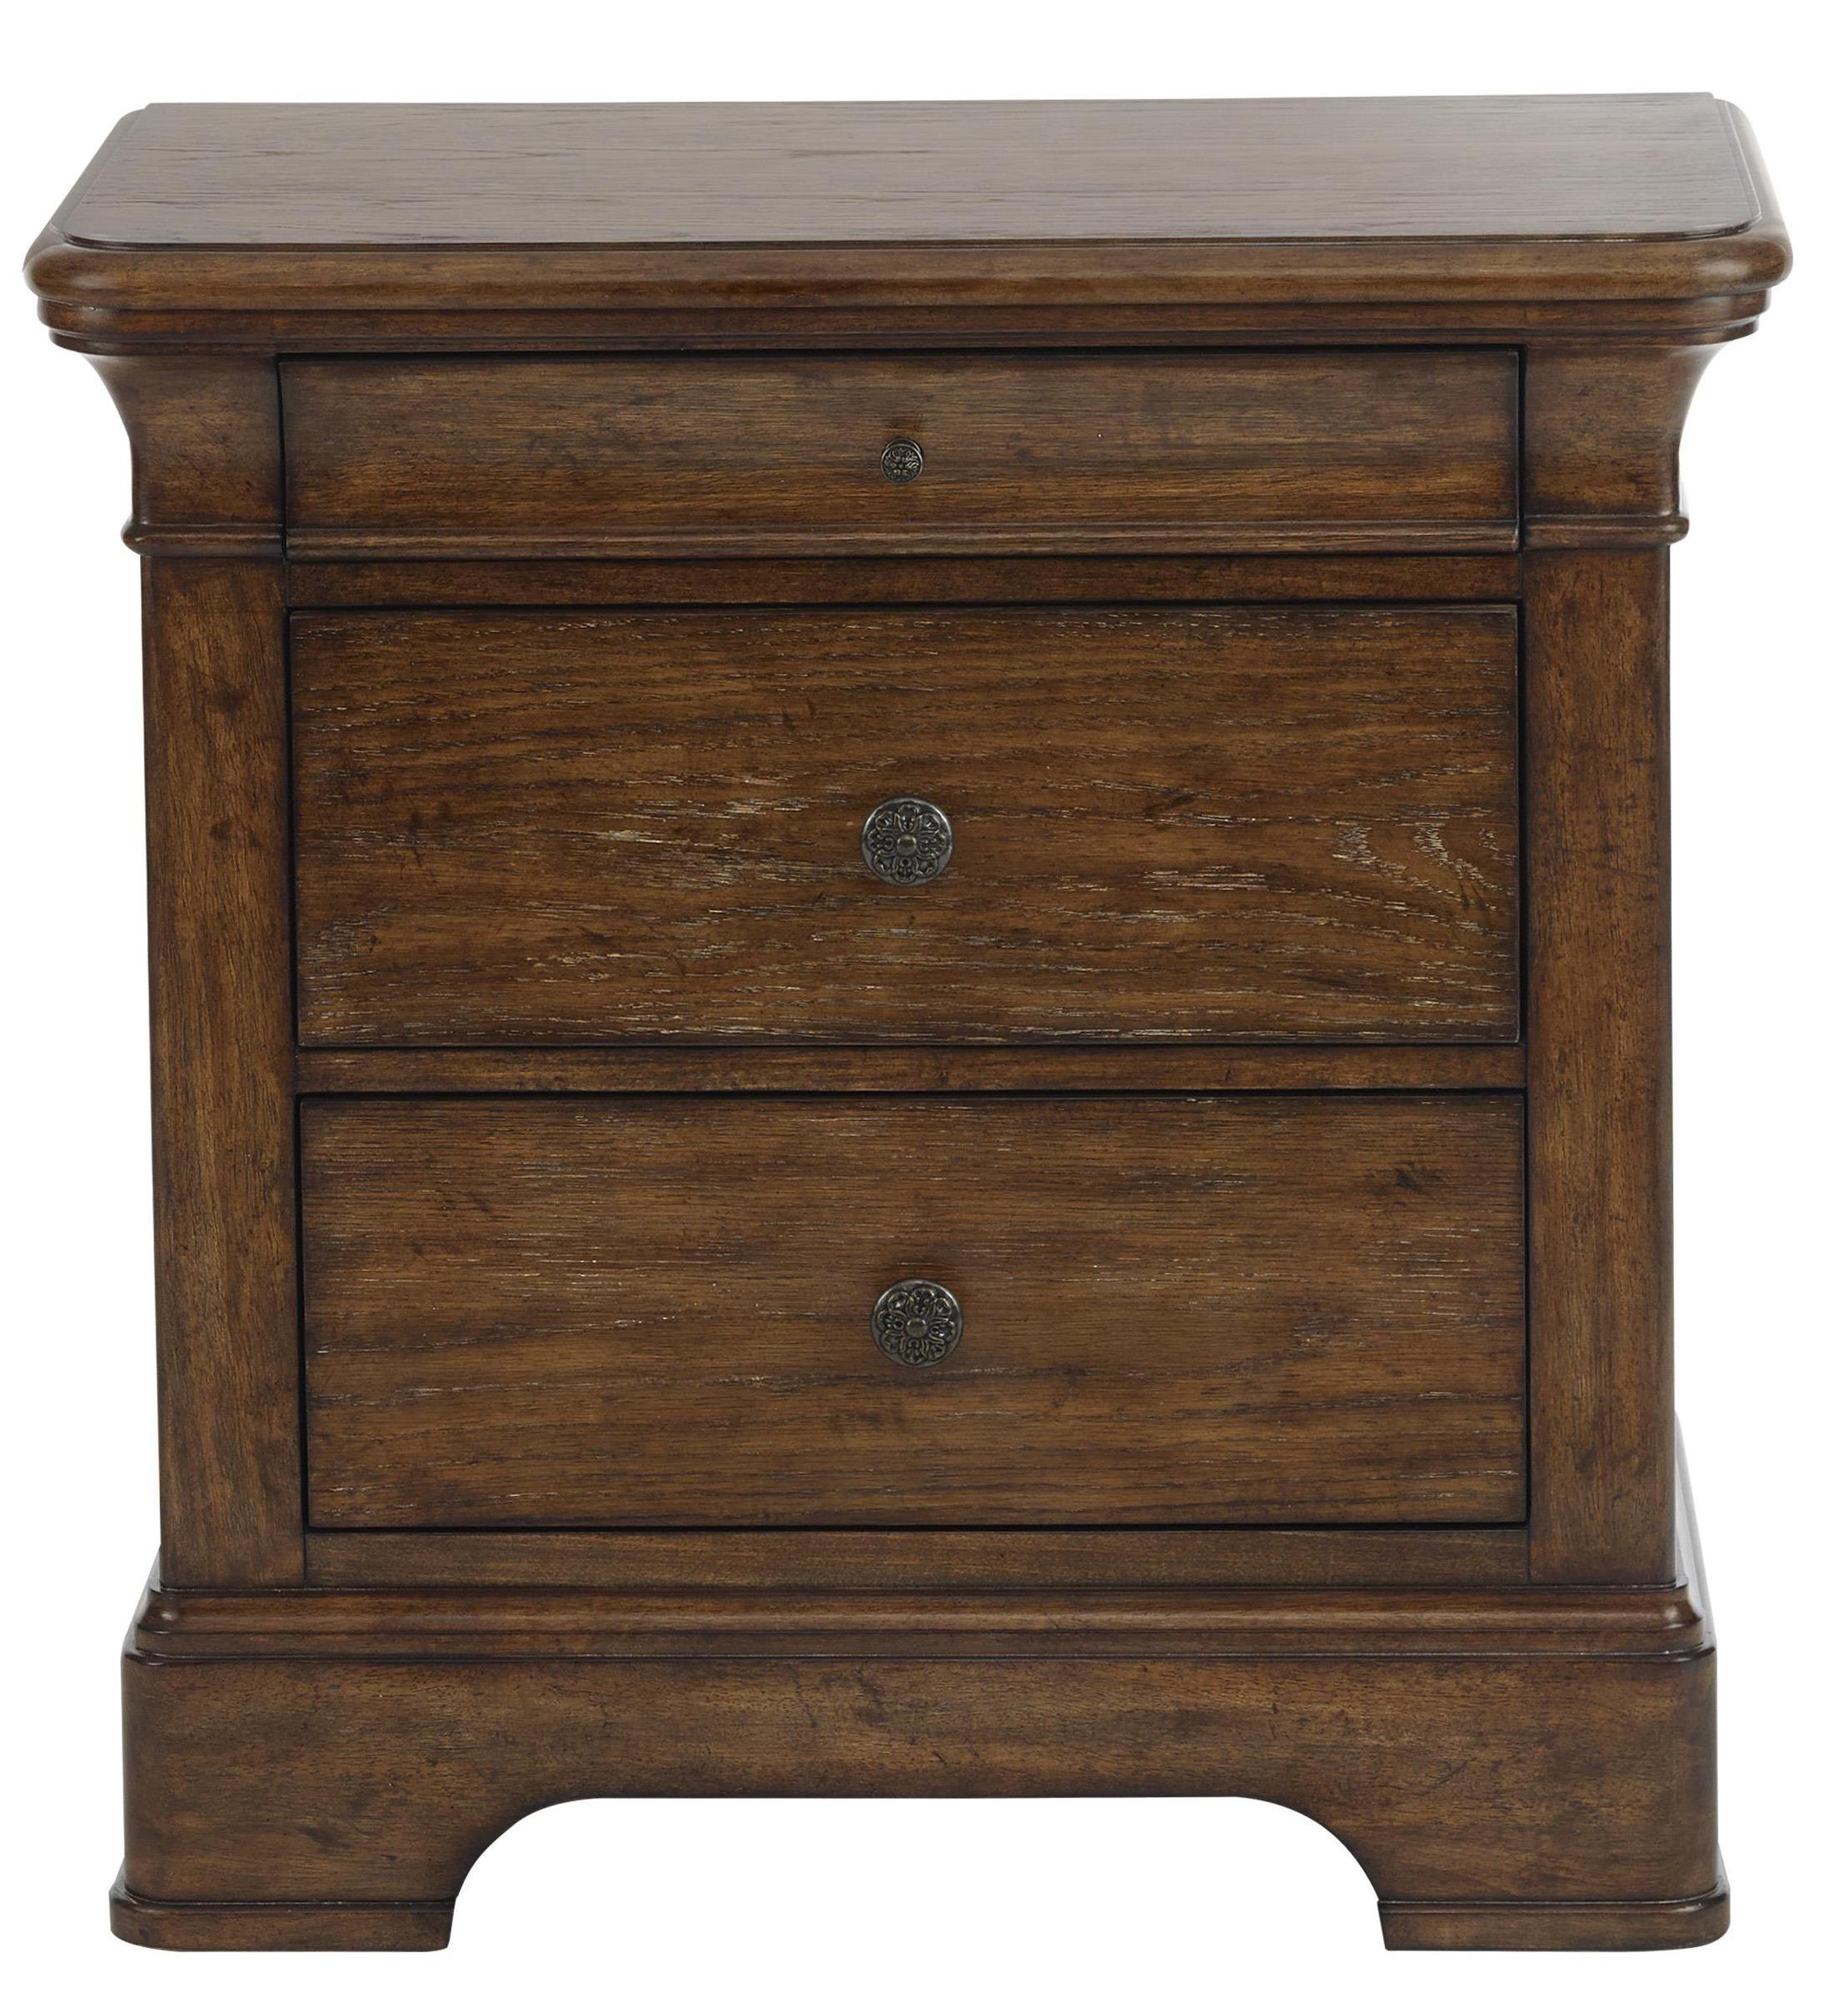 Belfort Select Virginia Mill 3 Drawer Nightstand - Item Number: 8854-050